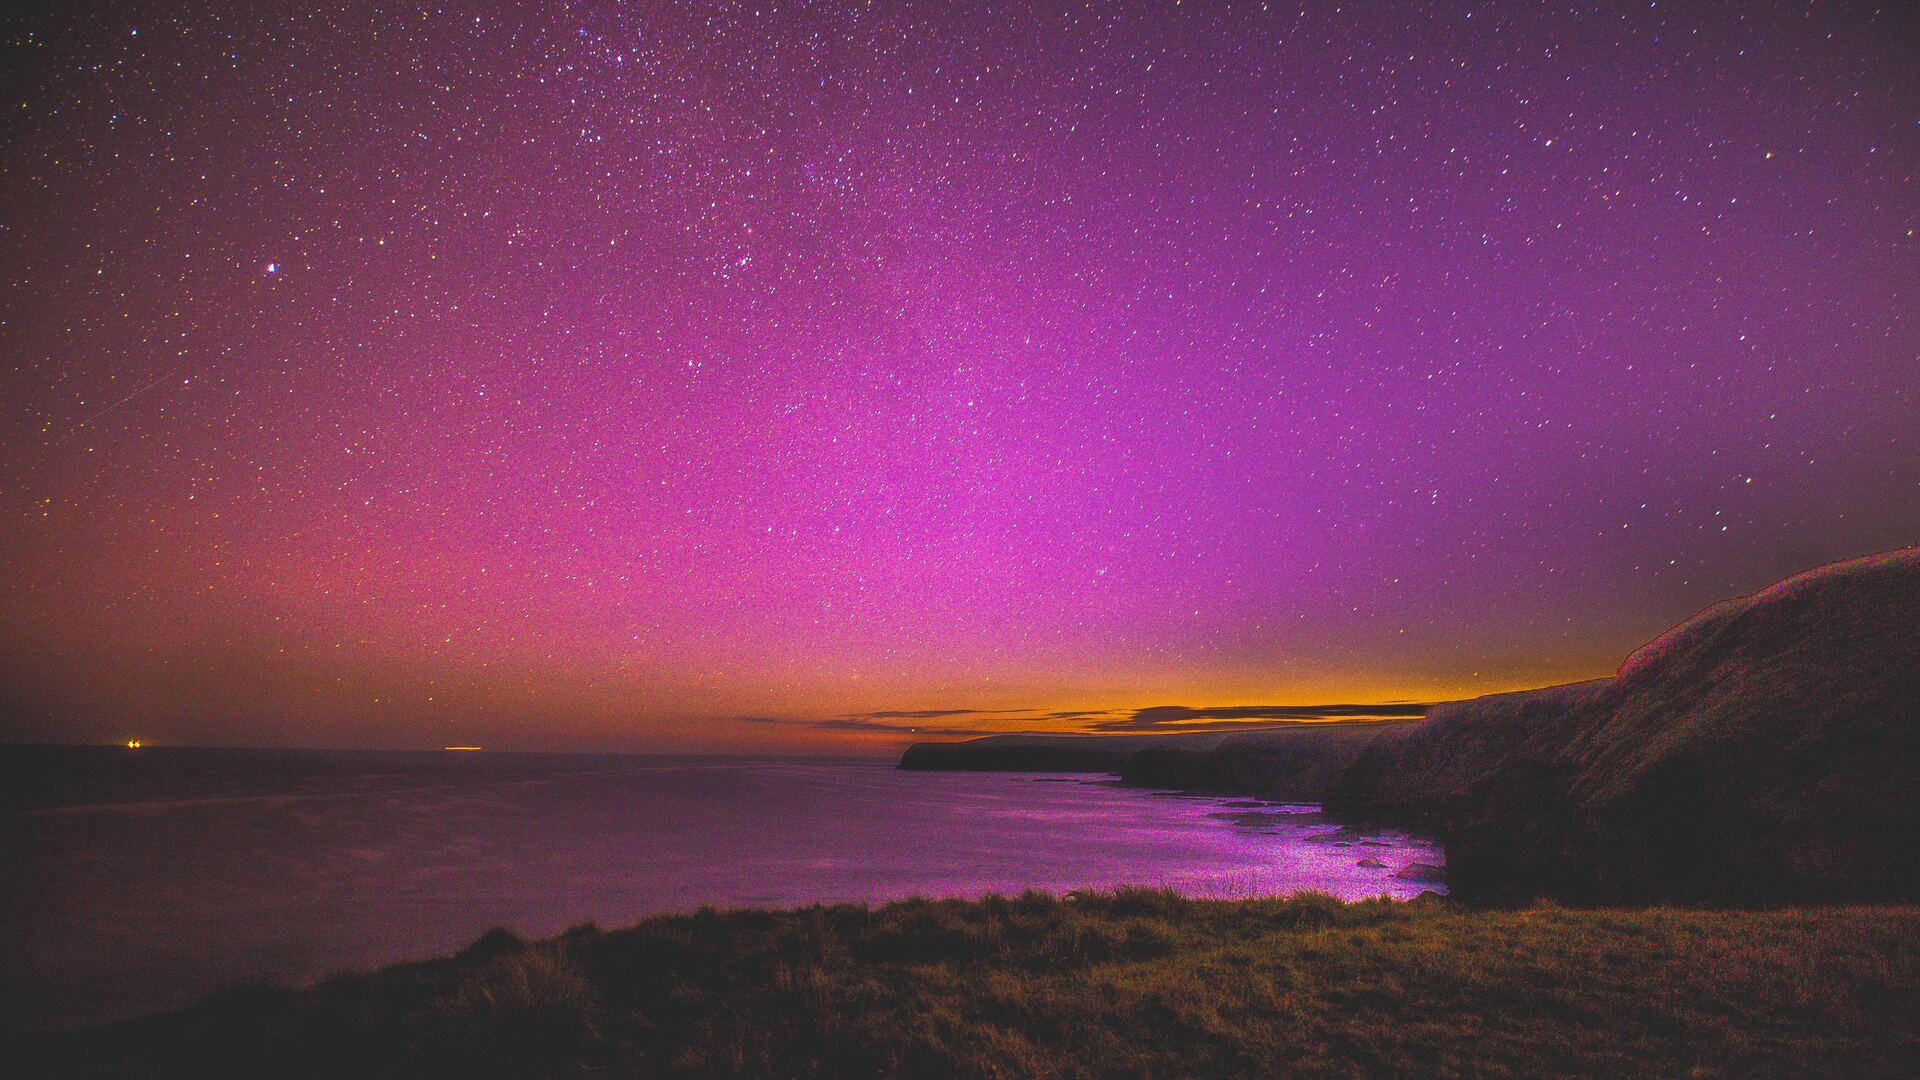 1920x1080 Pink Sky Full Of Stars Horizon Laptop Full Hd 1080p Hd